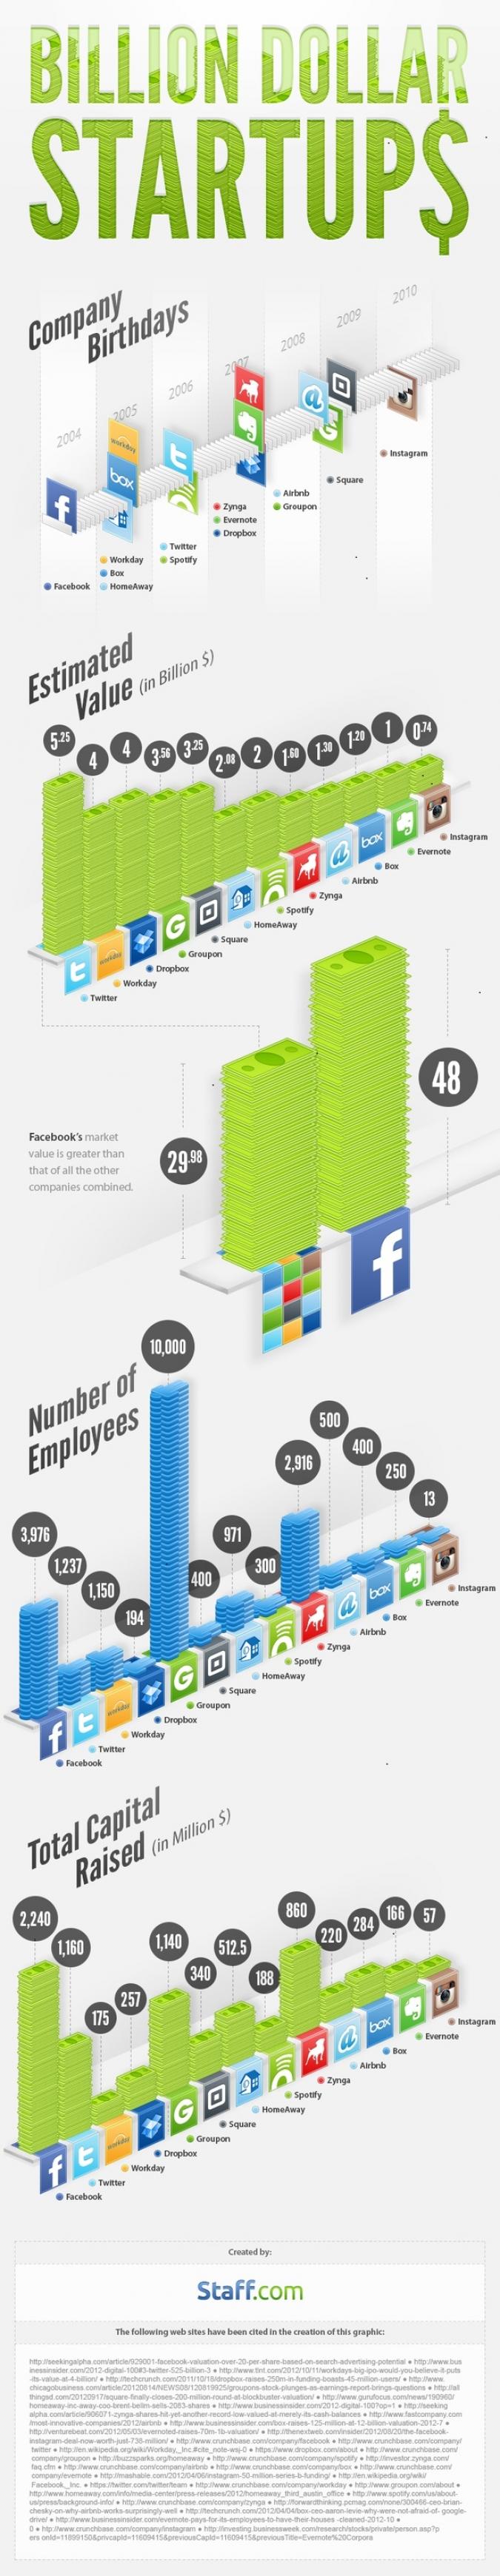 Infografik milliardenschwere Social Media Startups